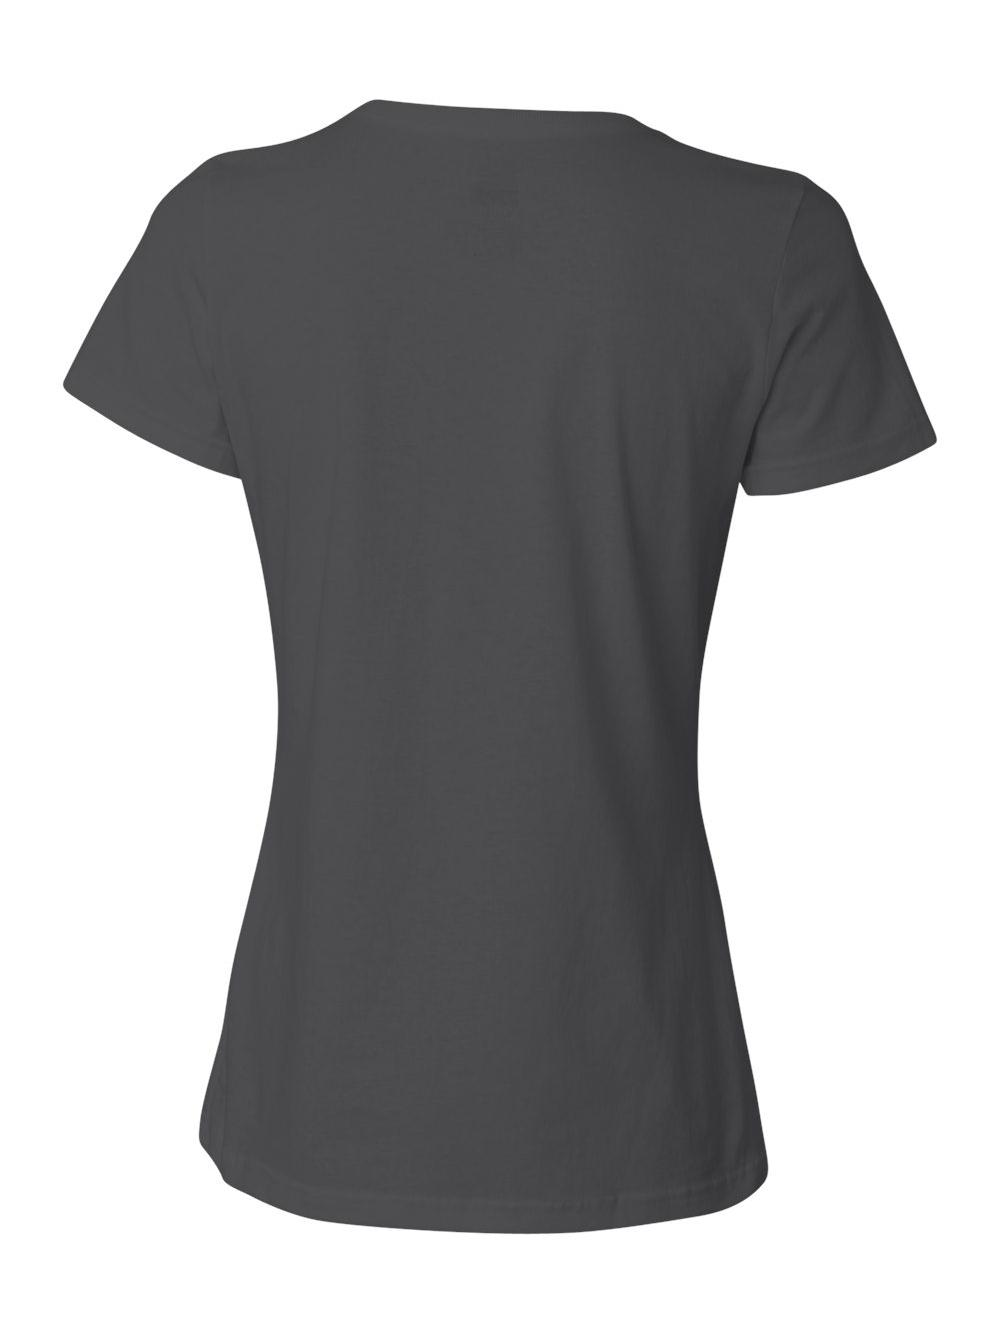 Fruit-of-the-Loom-HD-Cotton-Women-039-s-Short-Sleeve-T-Shirt-L3930R thumbnail 10